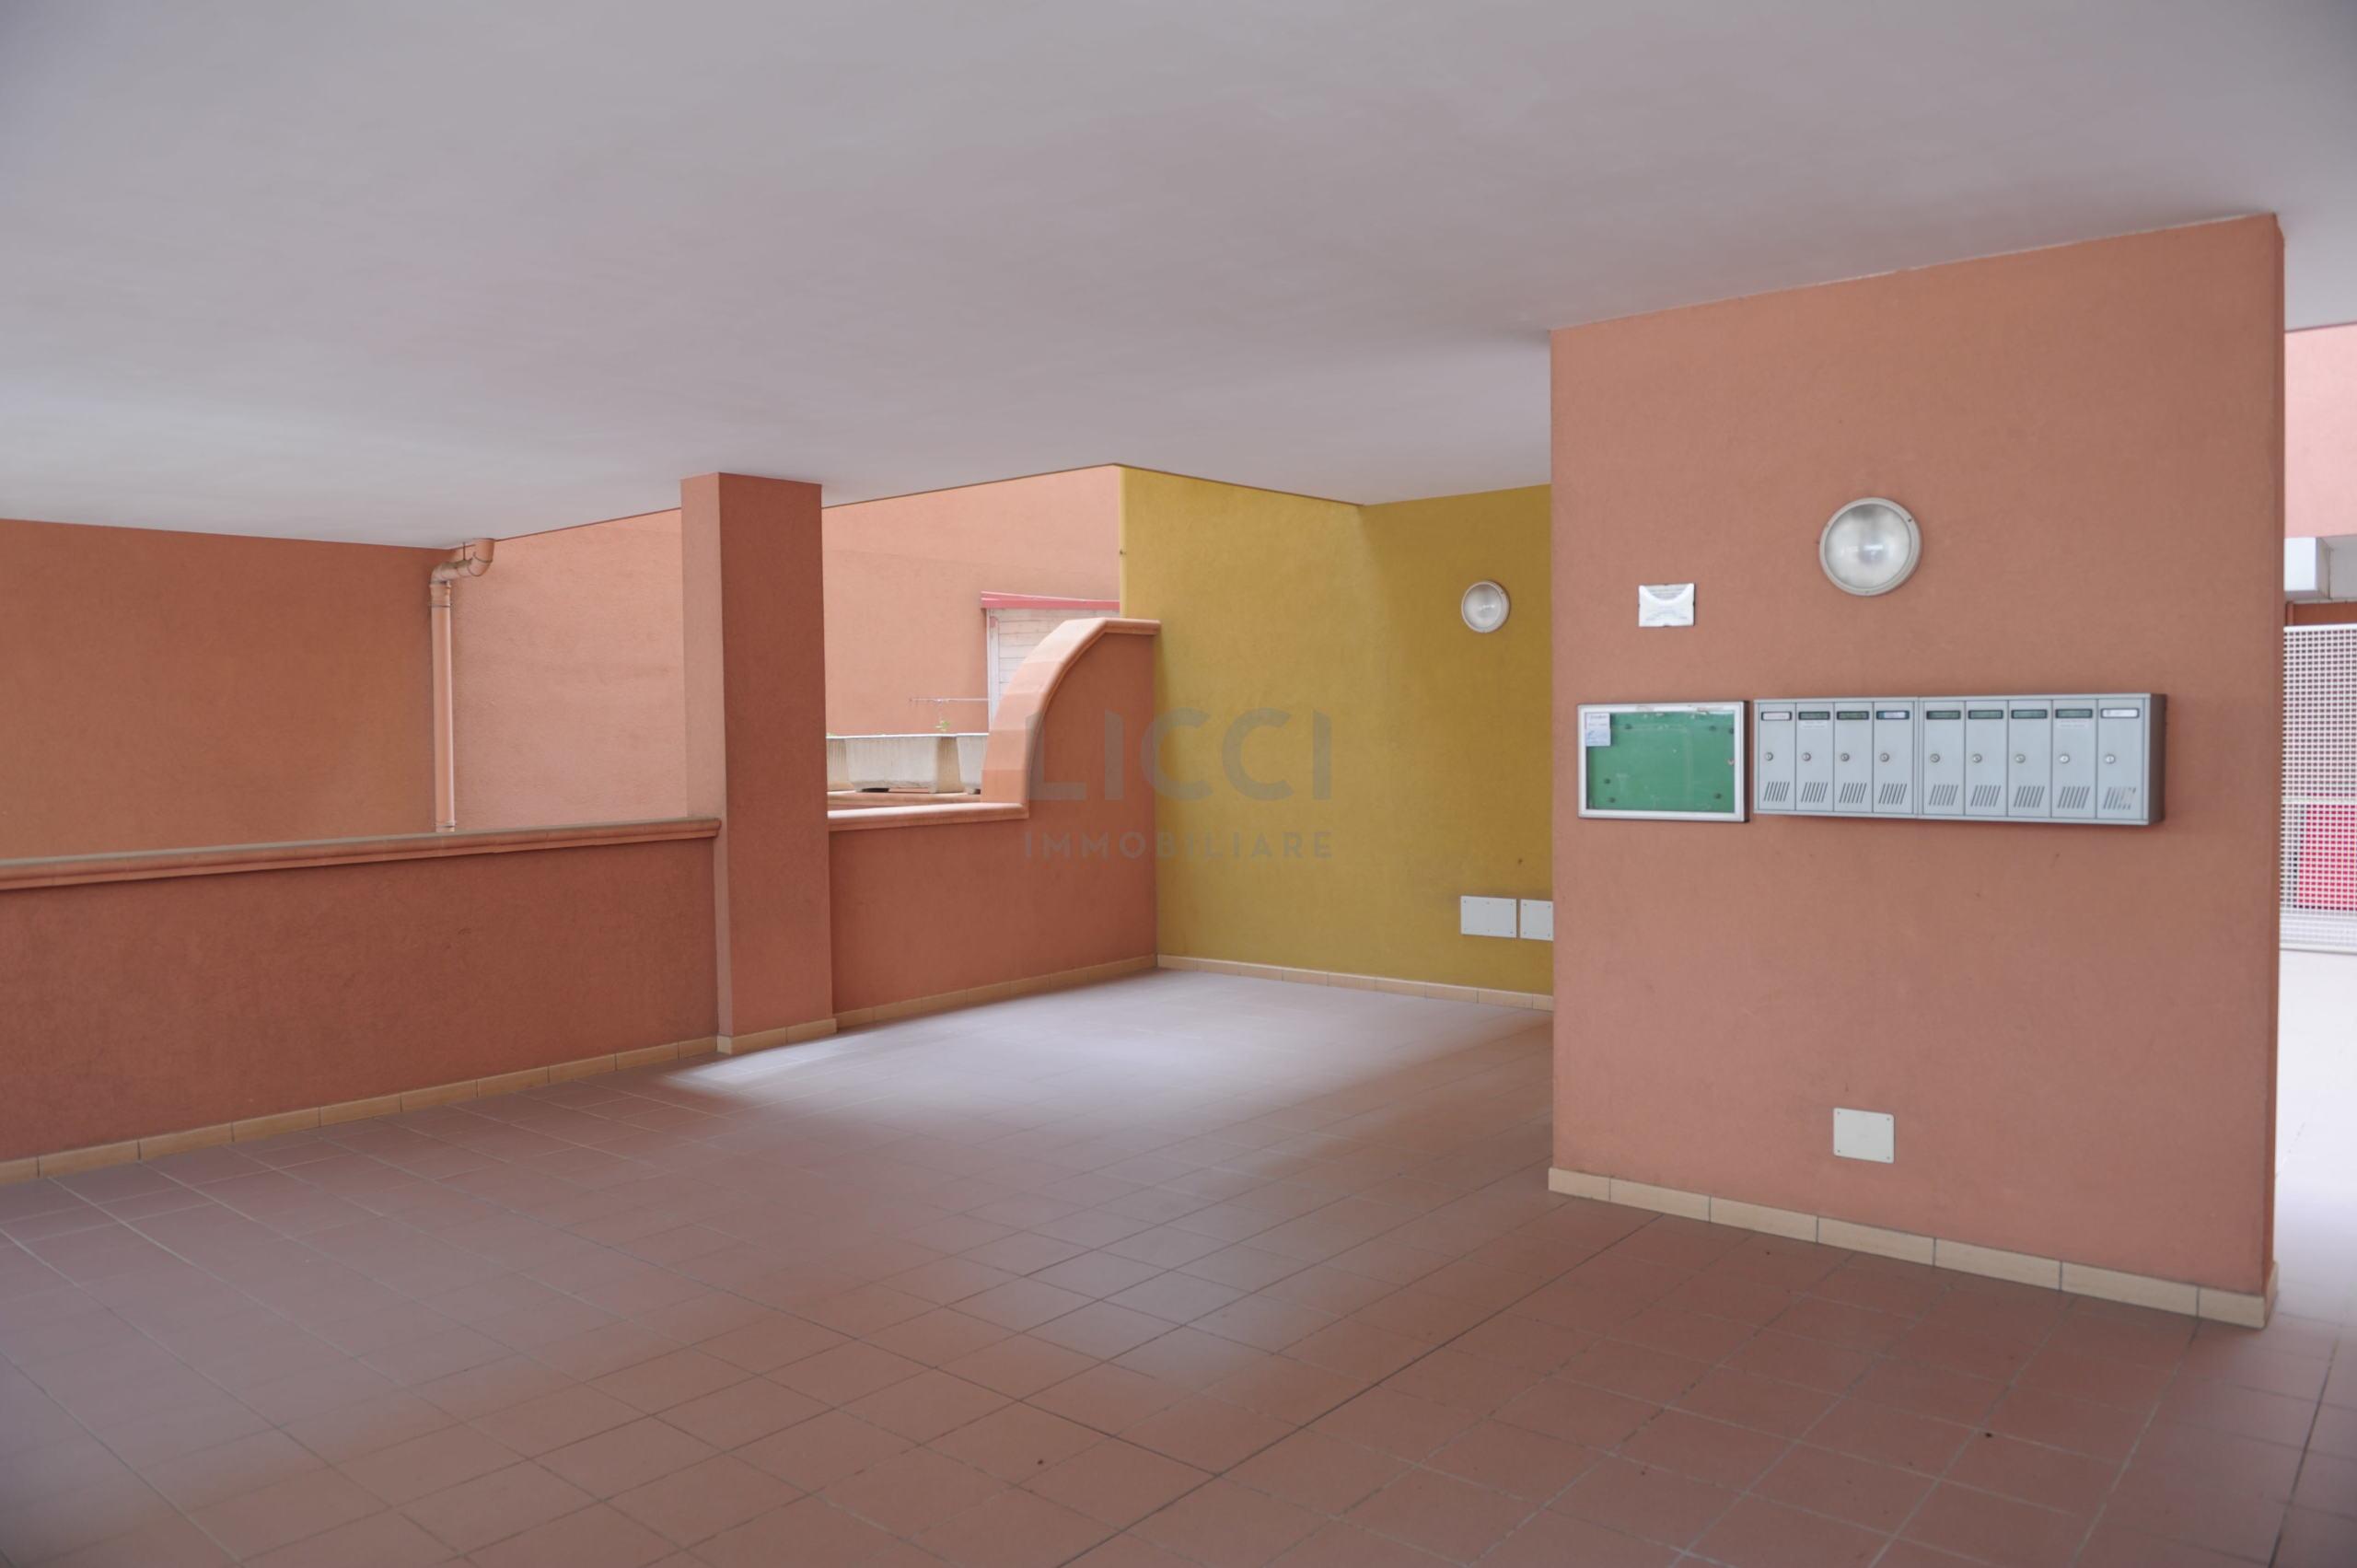 Appartamento a Monopoli Via Belvedere 60, Periferia